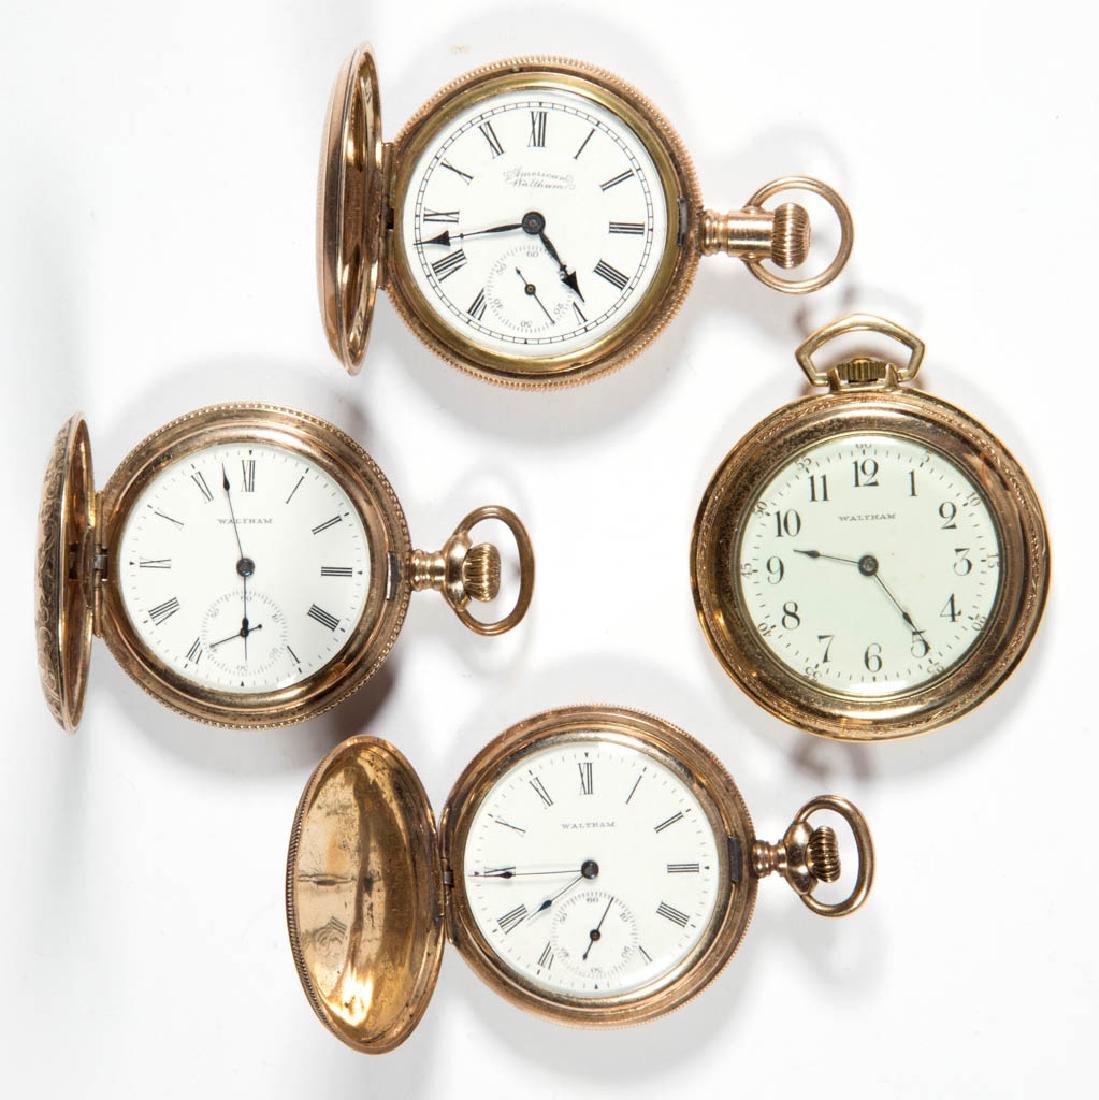 WALTHAM SEVEN-JEWEL MODEL 1890 POCKET WATCHES, LOT OF